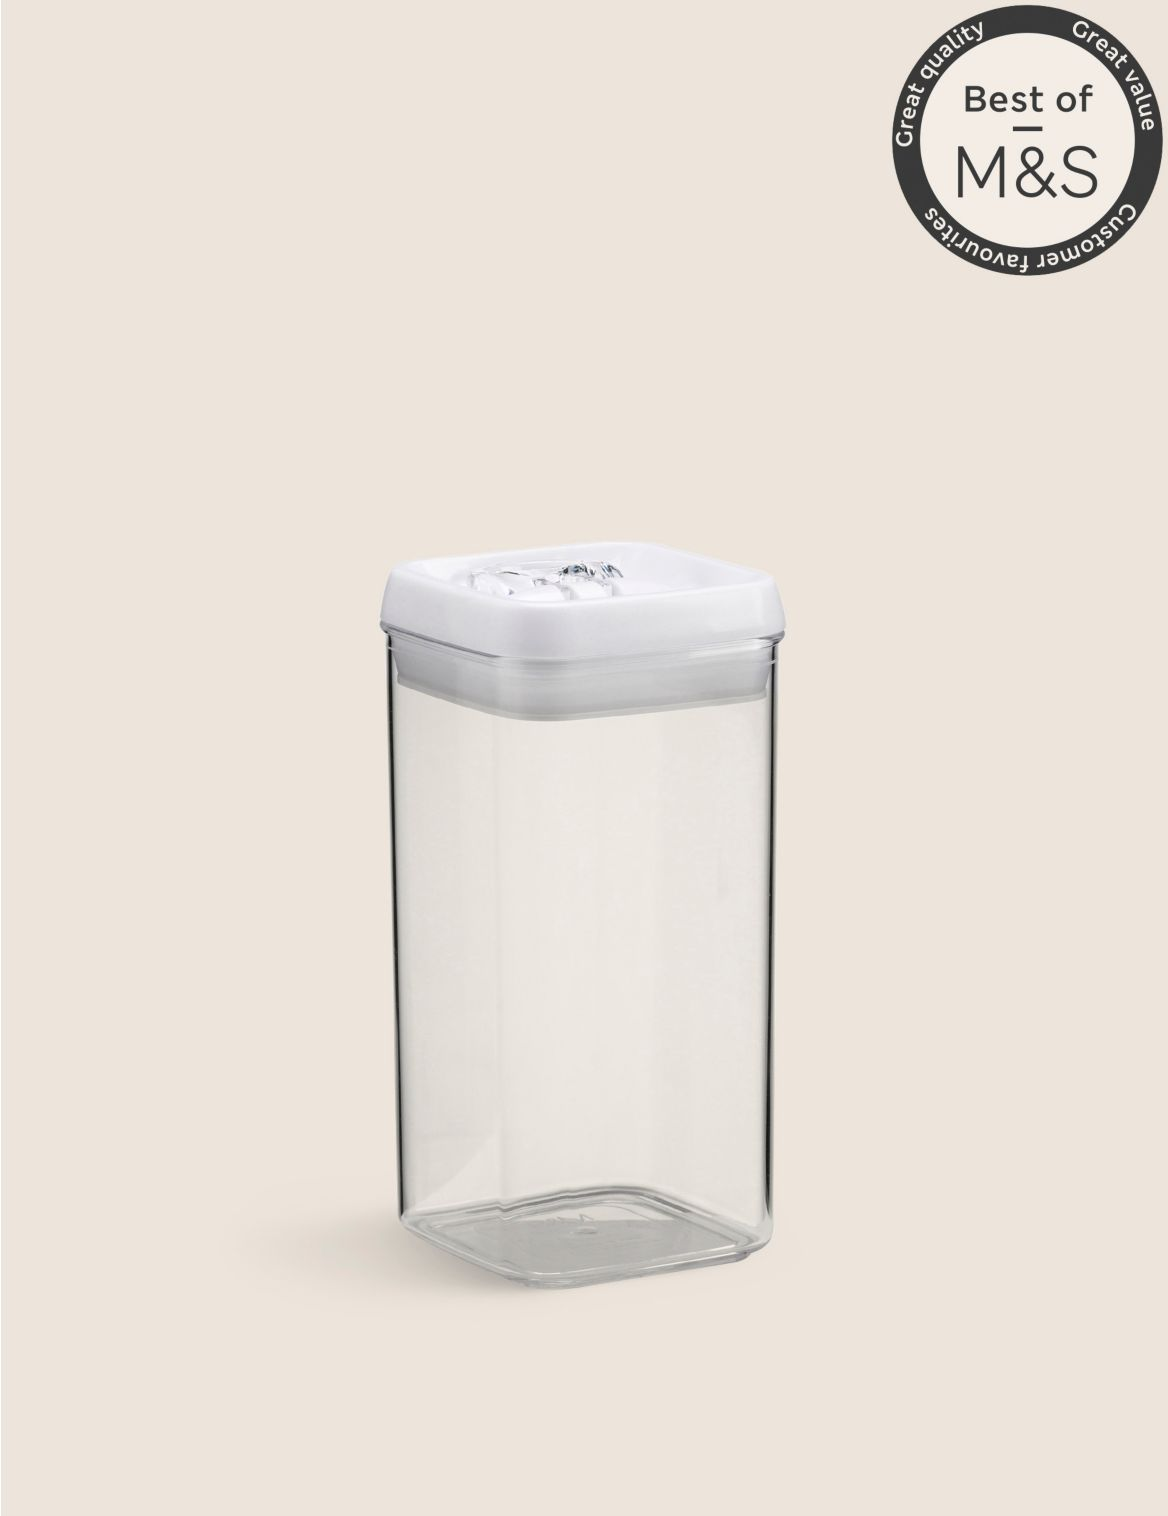 1.2L Rectangular Flip-Tight Food Storage white